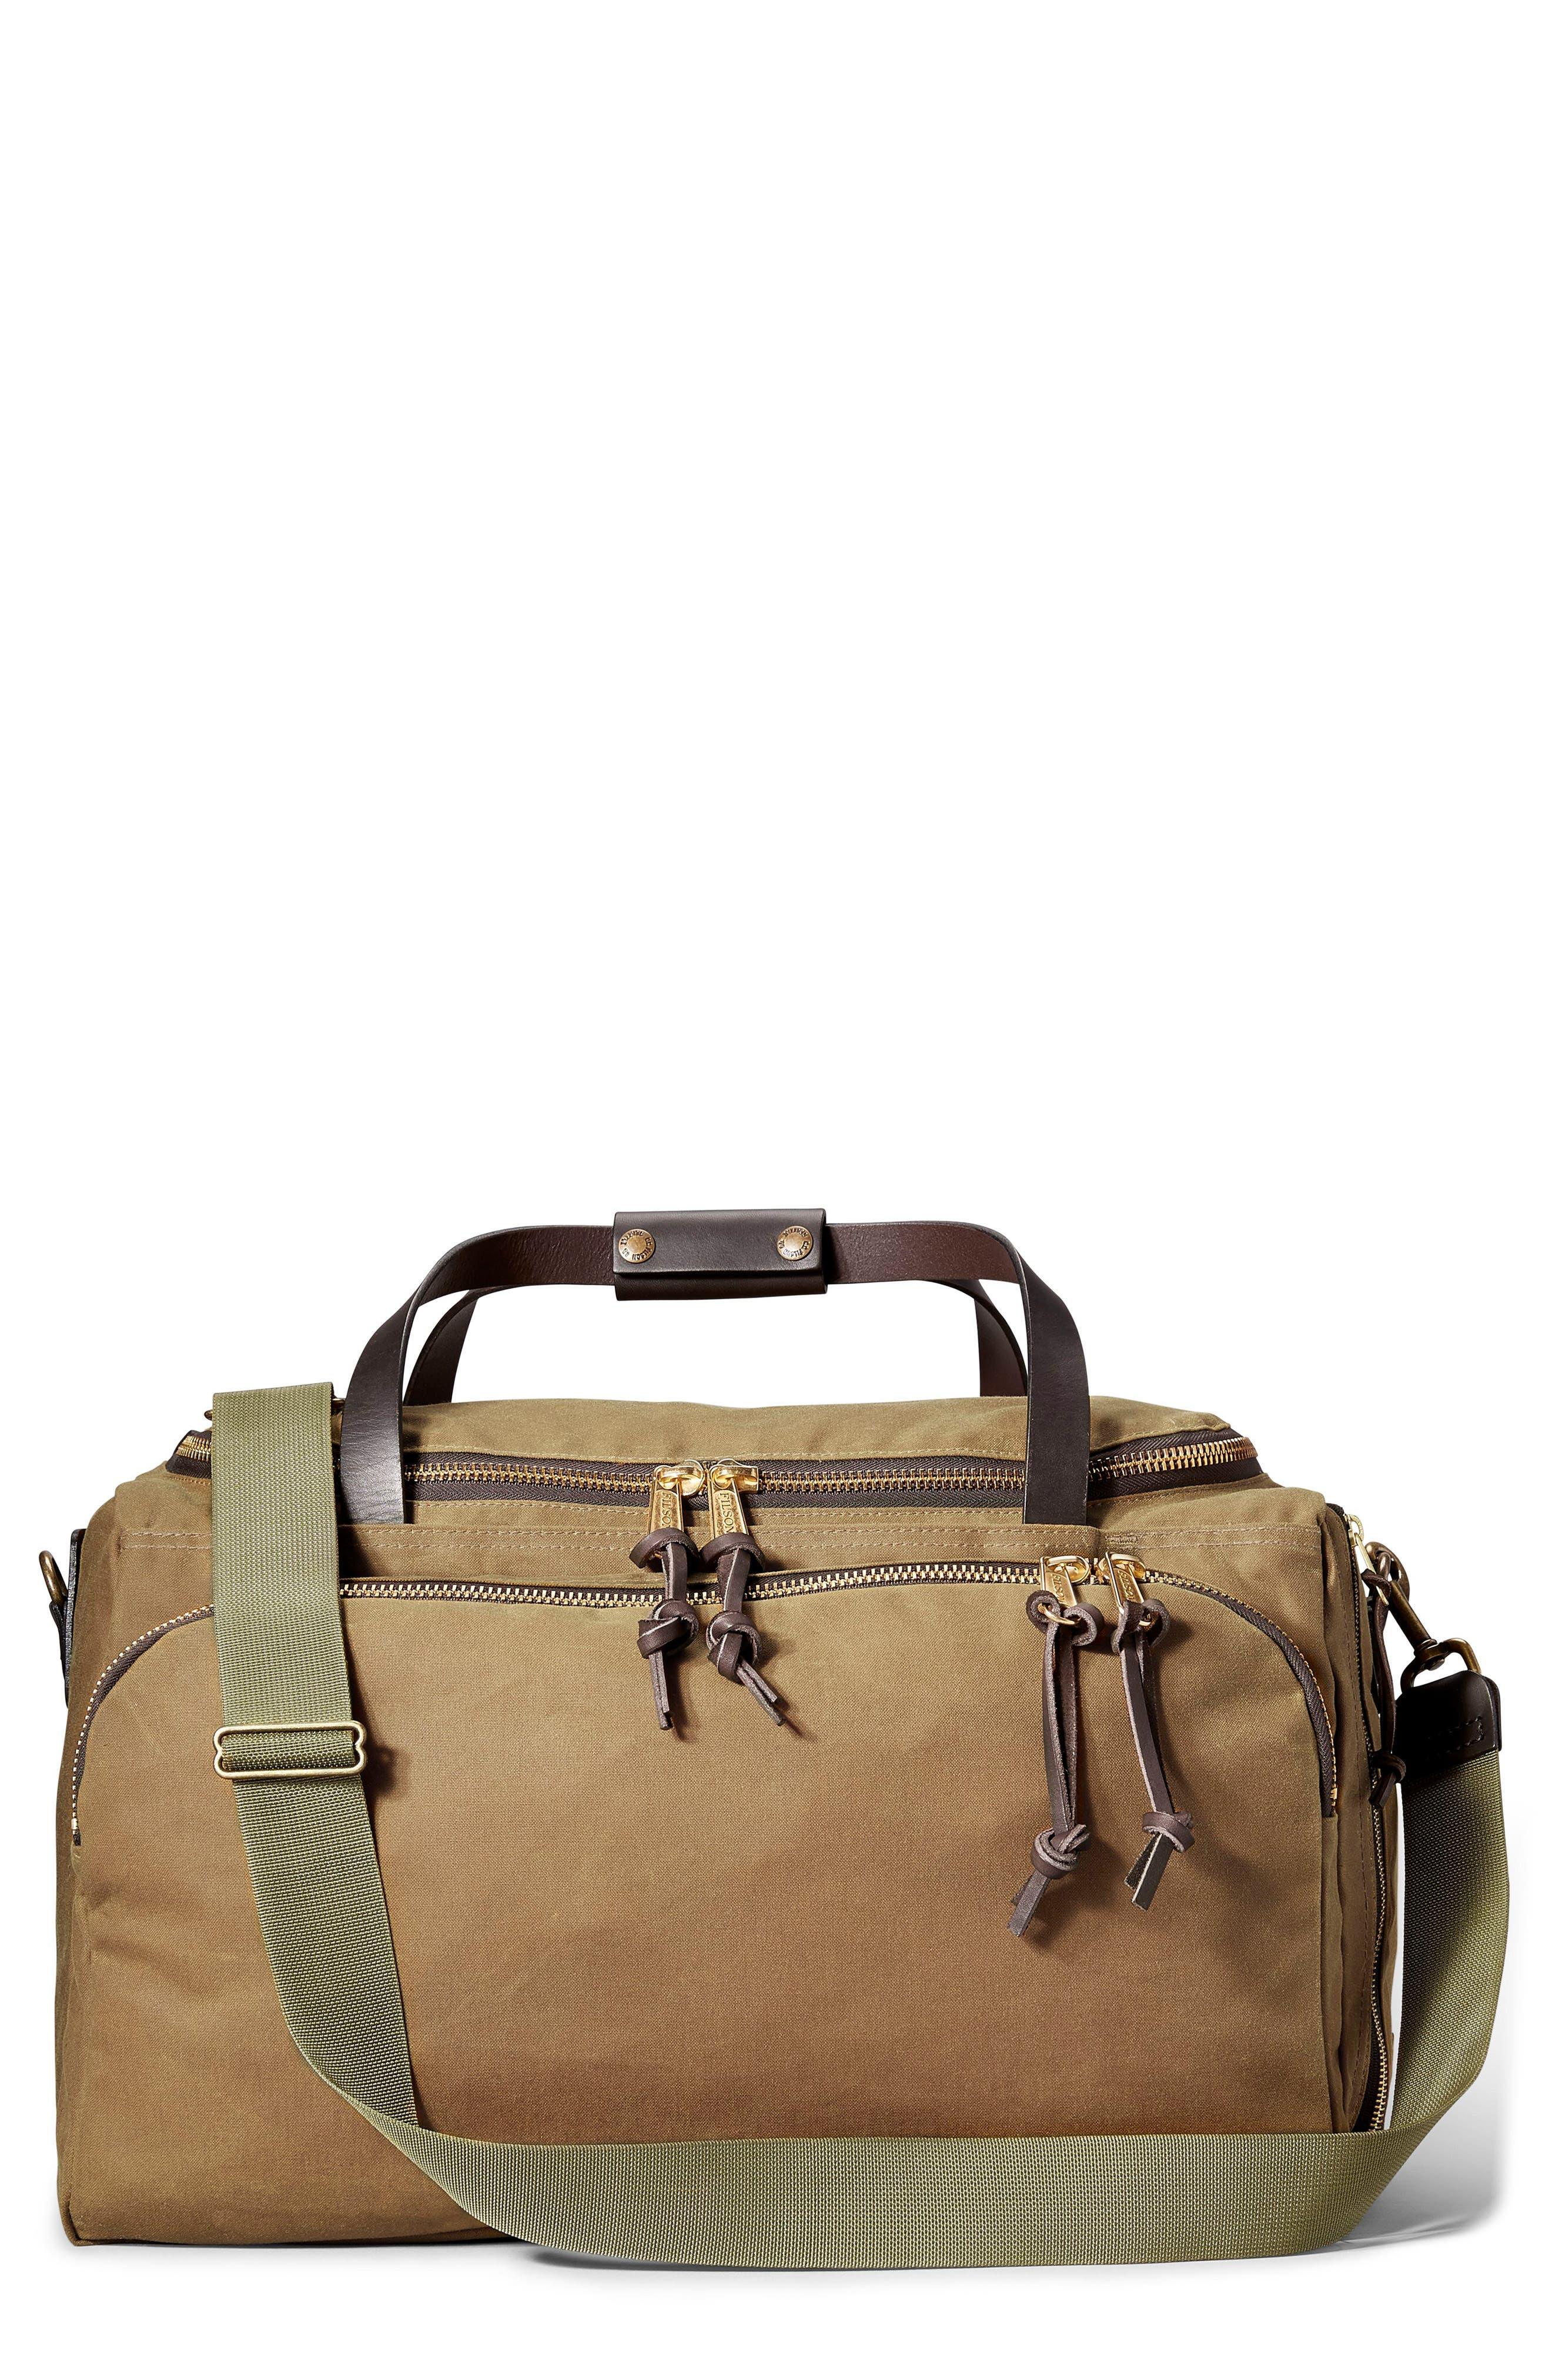 Excursion Duffel Bag,                             Main thumbnail 1, color,                             TAN